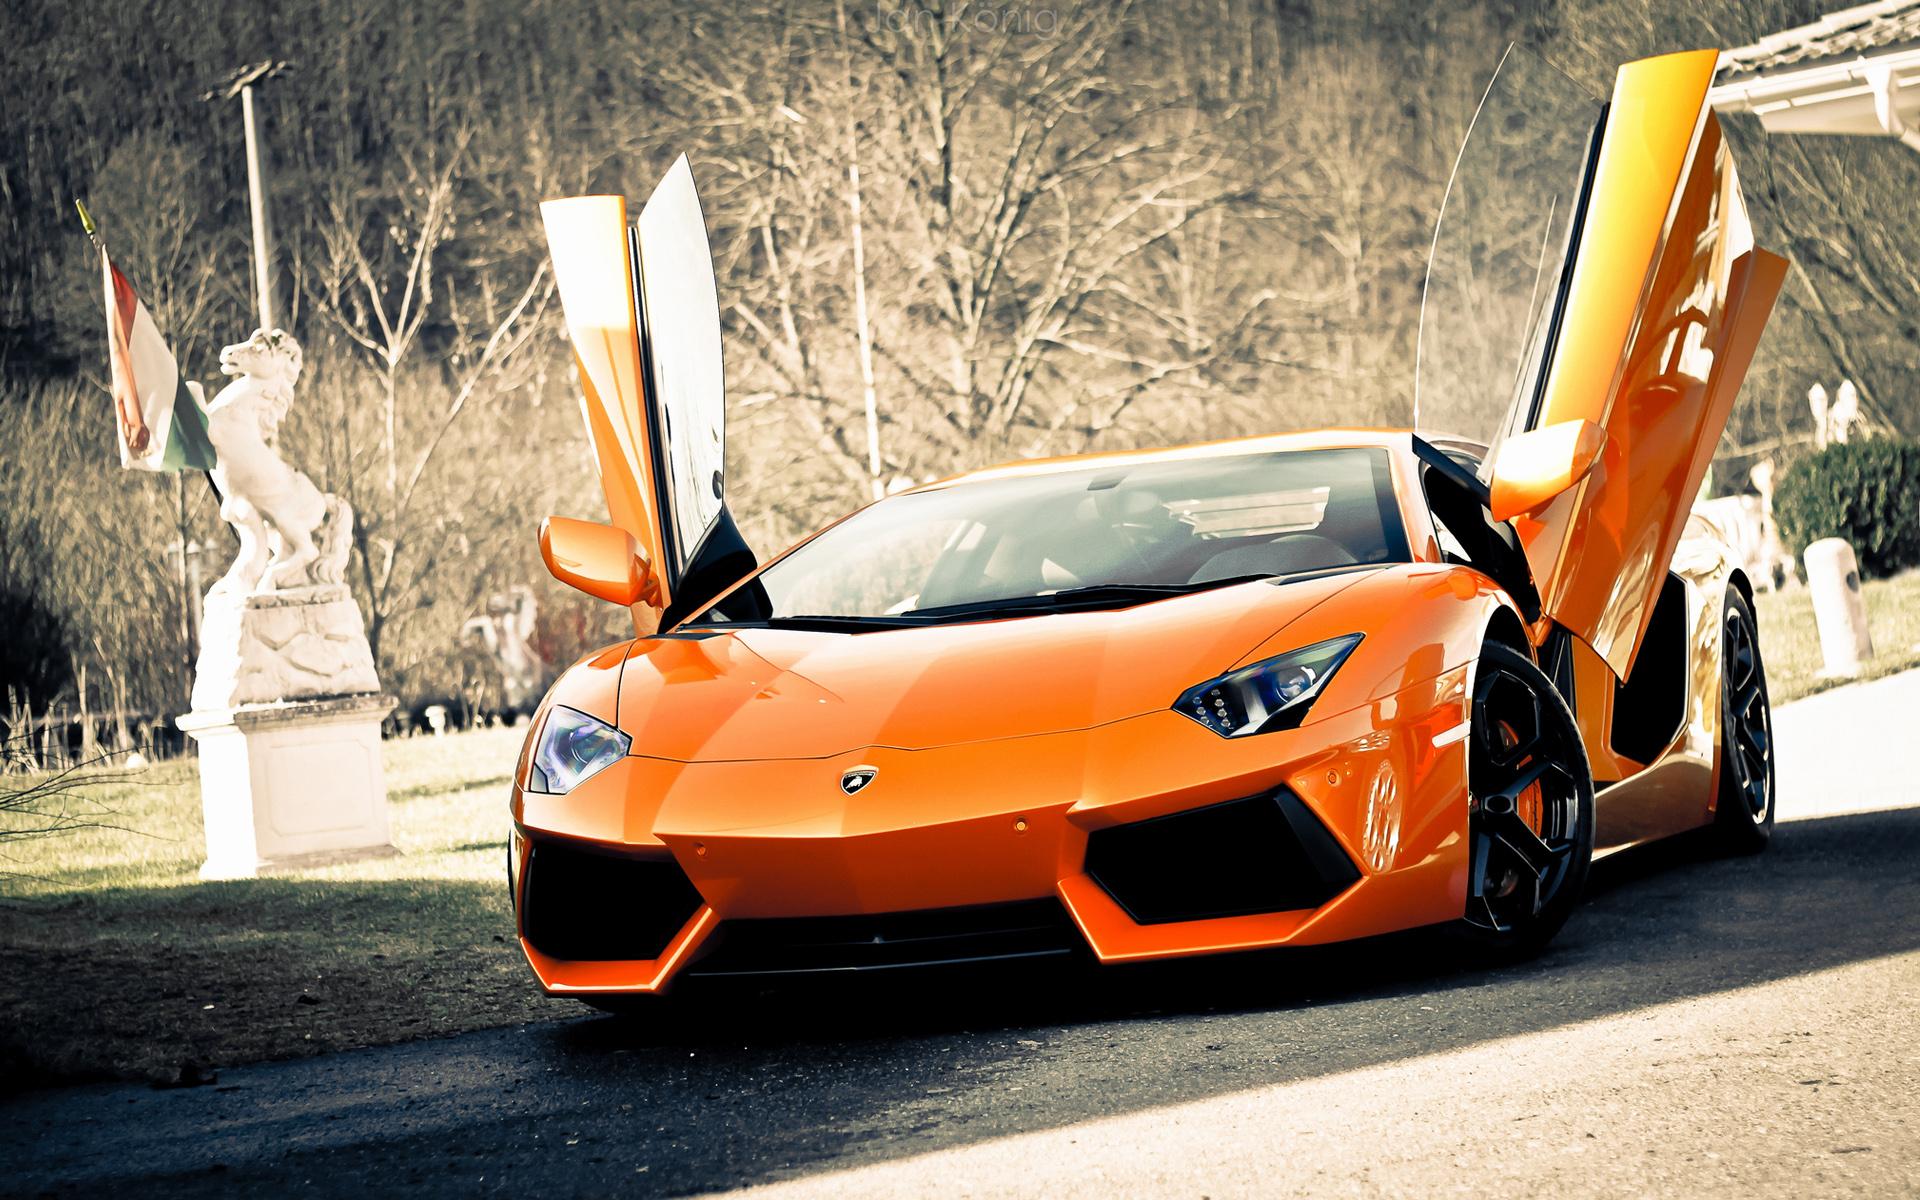 Off Road Cars Hd Wallpapers Best Of Lamborghini Wallpaper Hd Car Wallpapers Id 2916